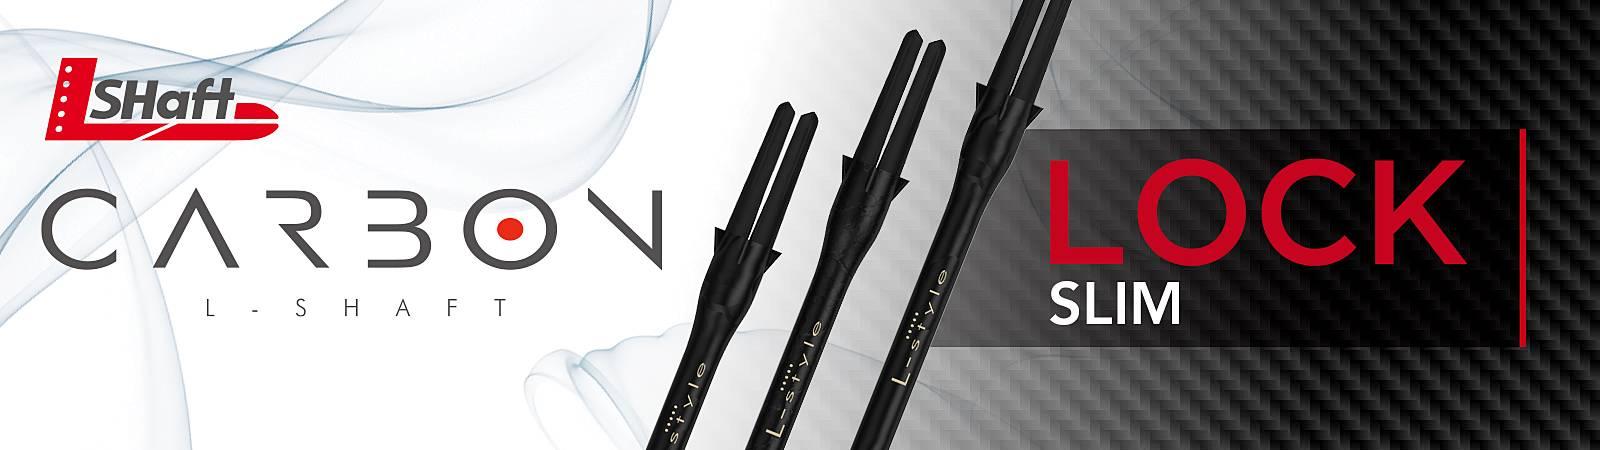 L-Style L-Shafts Carbon Lock Slim Shafts